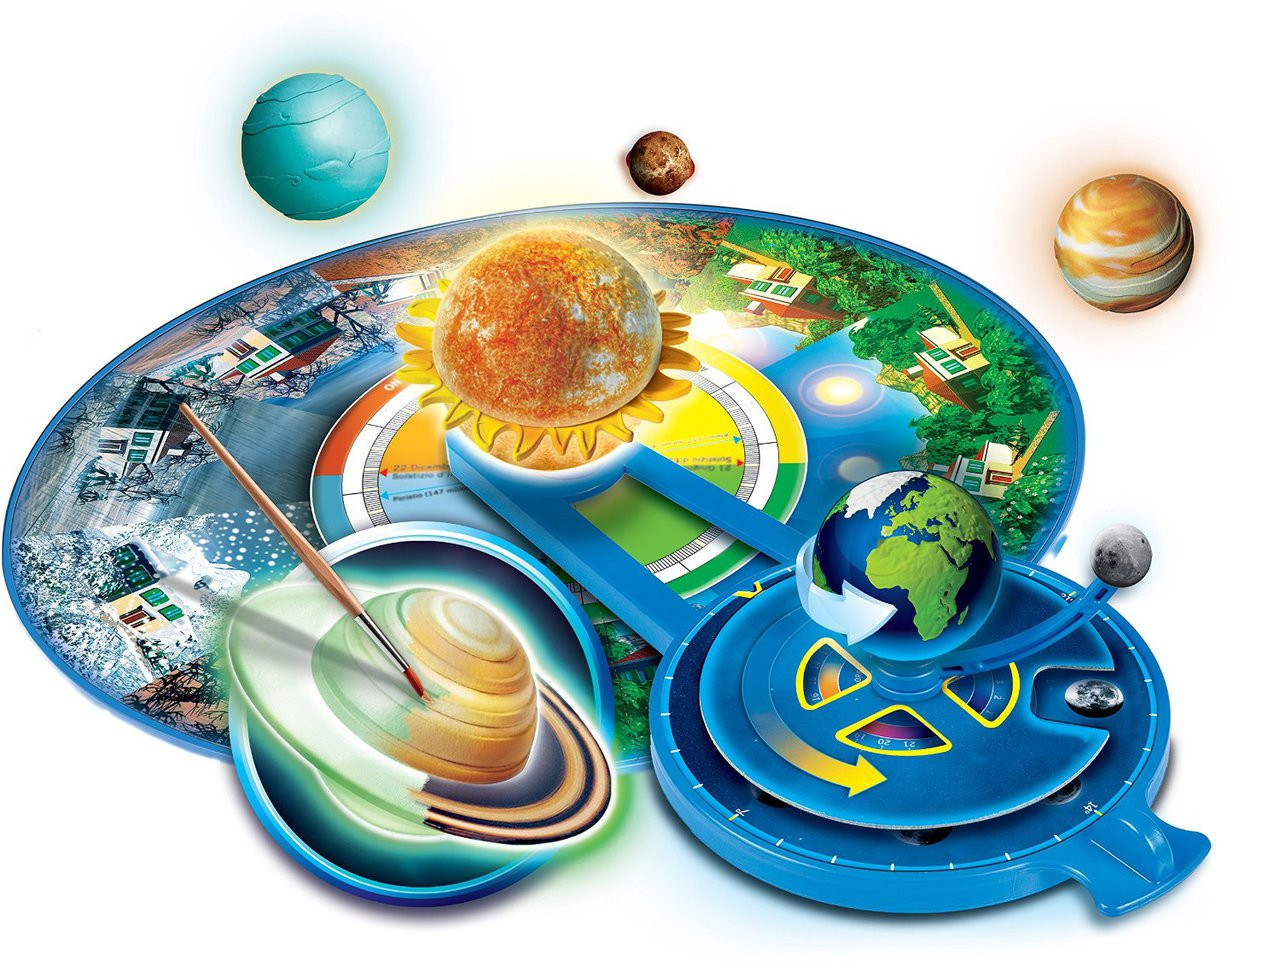 http://store-svx5q.mybigcommerce.com/product_images/web/8005125612512-2.jpg